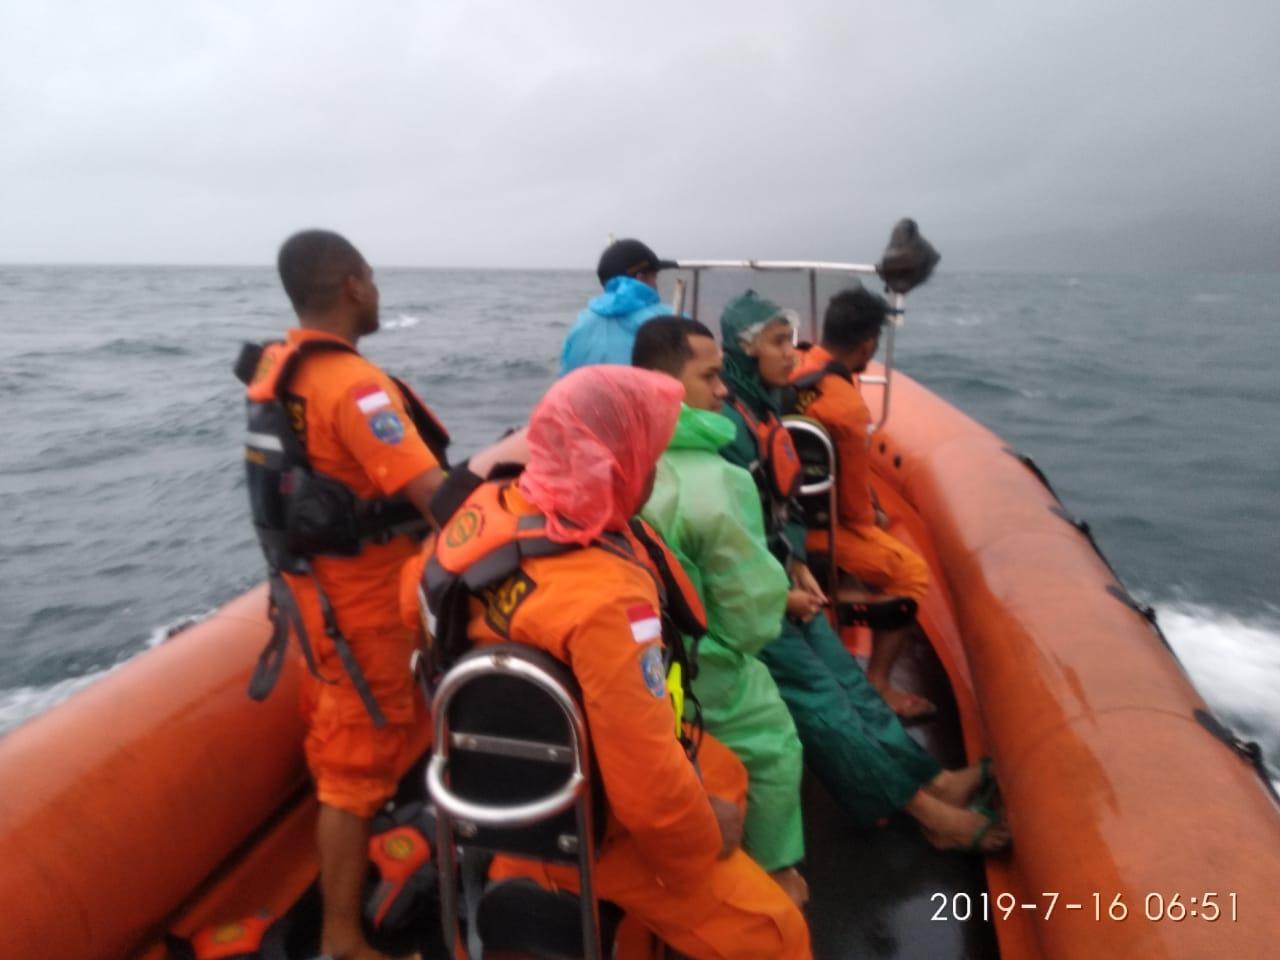 4 Hari Pencarian Penumpang KM Tidar, Diduga Posisi Korban Bergeser dari Lokasi Jatuh